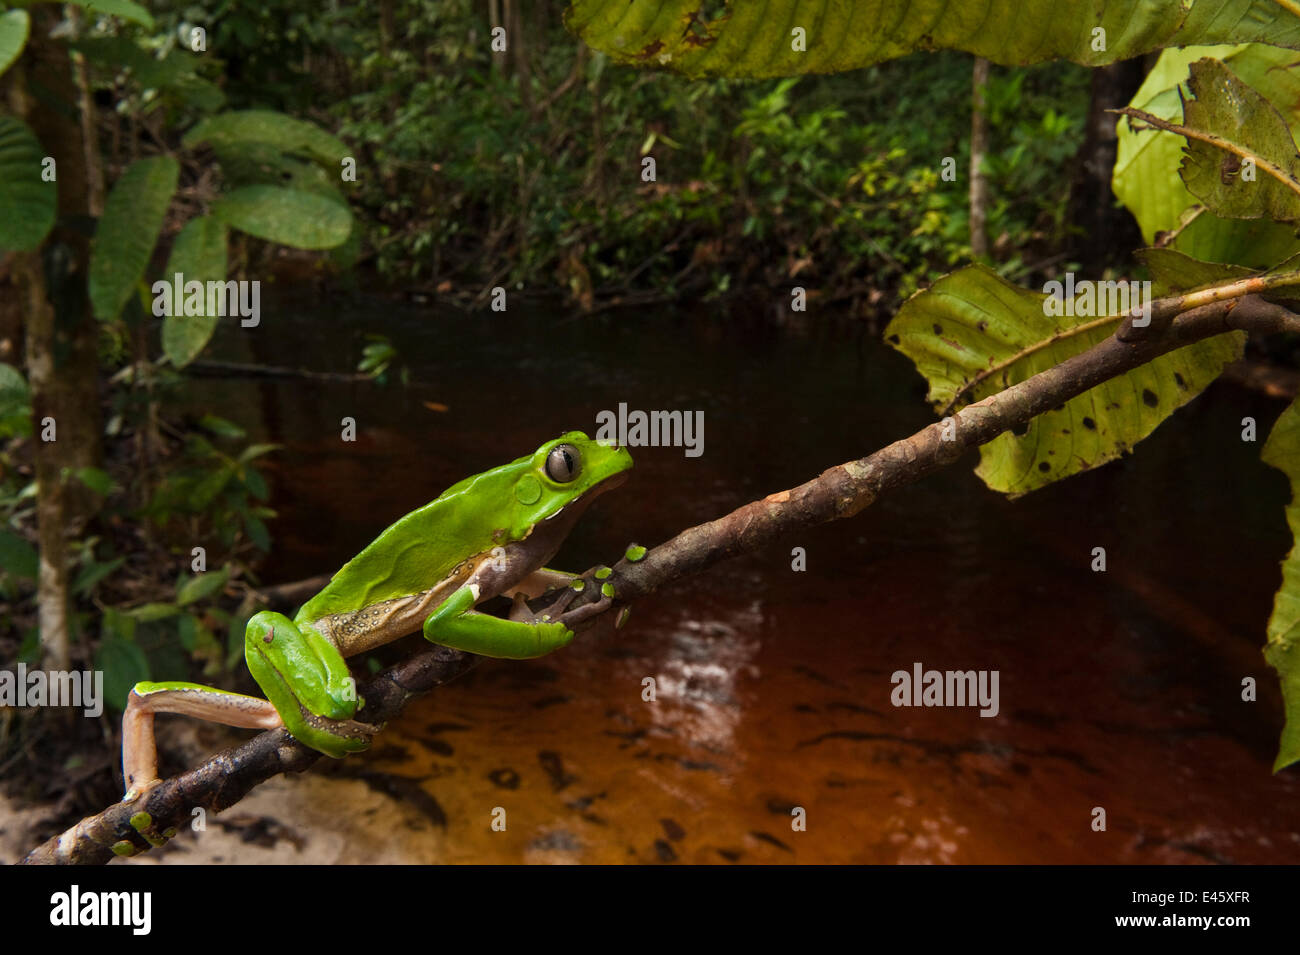 Giant leaf frog (Phyllomedusa bicolor) climbing along branch in rainforest, Iwokrama Reserve, Guyana Stock Photo